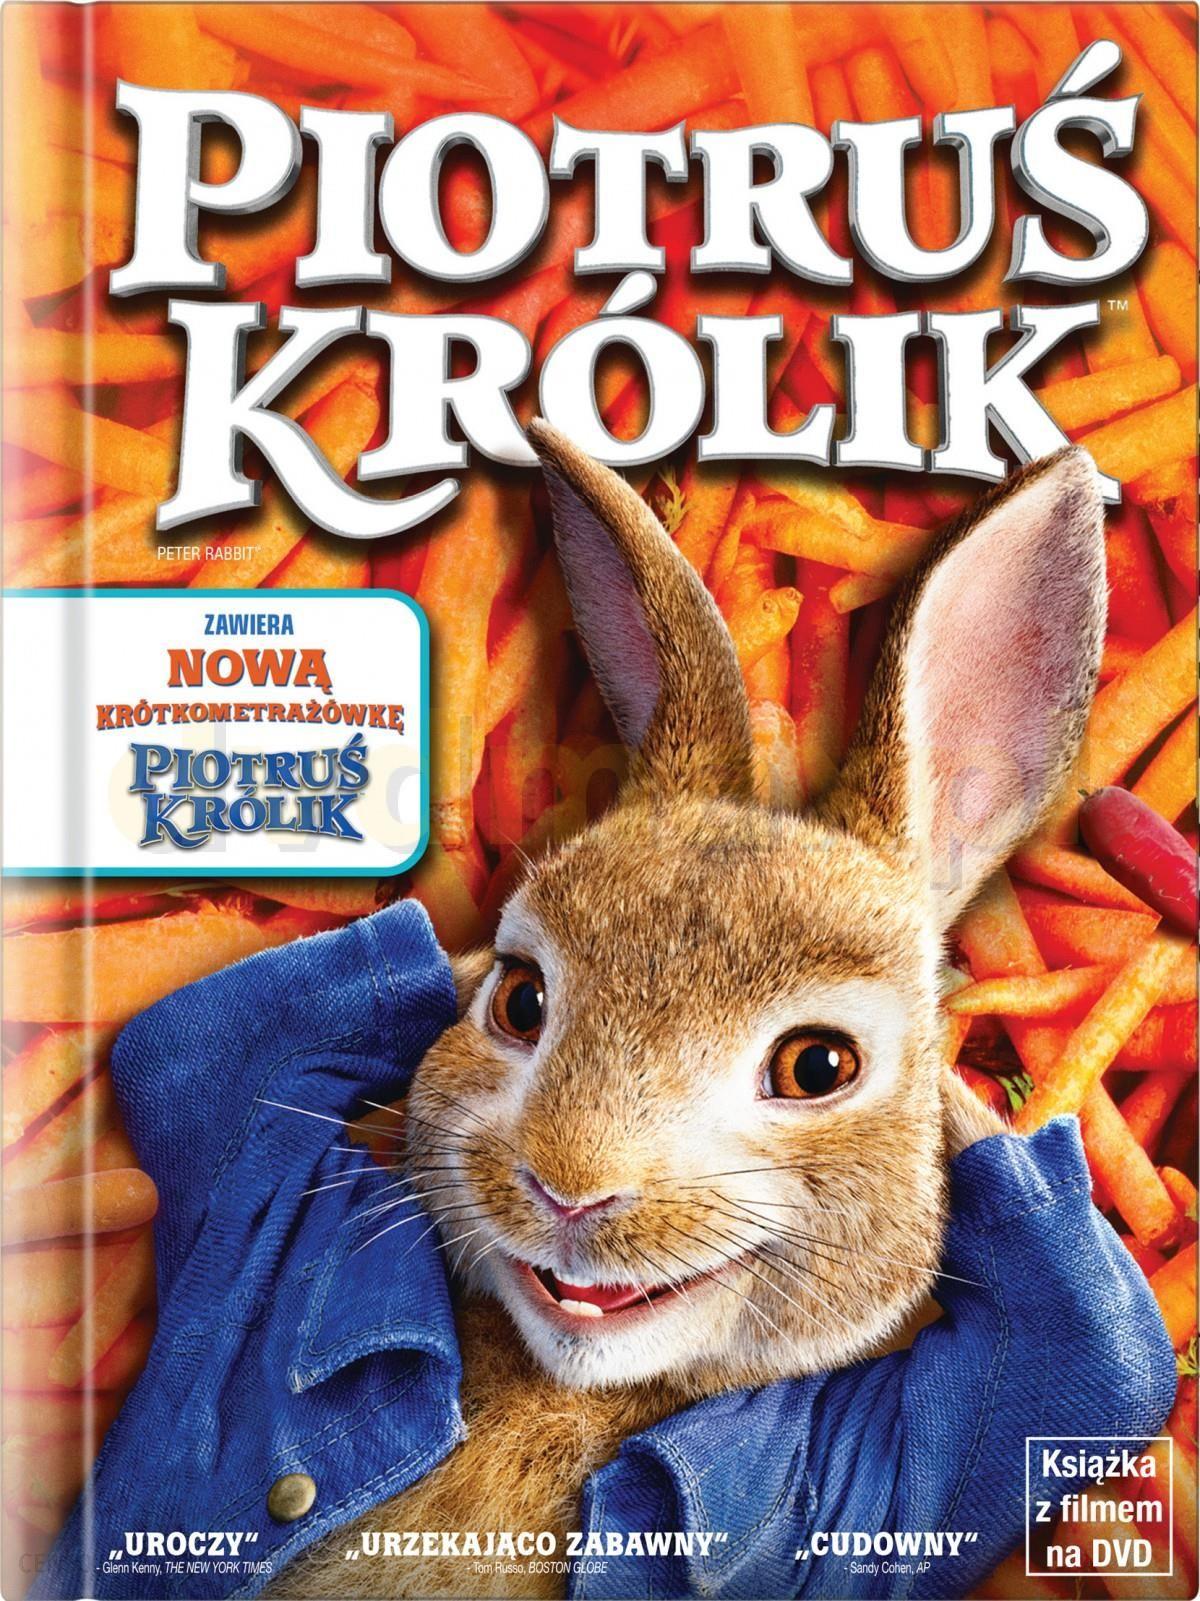 6dfc32e4e8 Film DVD Piotruś Królik (booklet)  DVD  - Ceny i opinie - Ceneo.pl